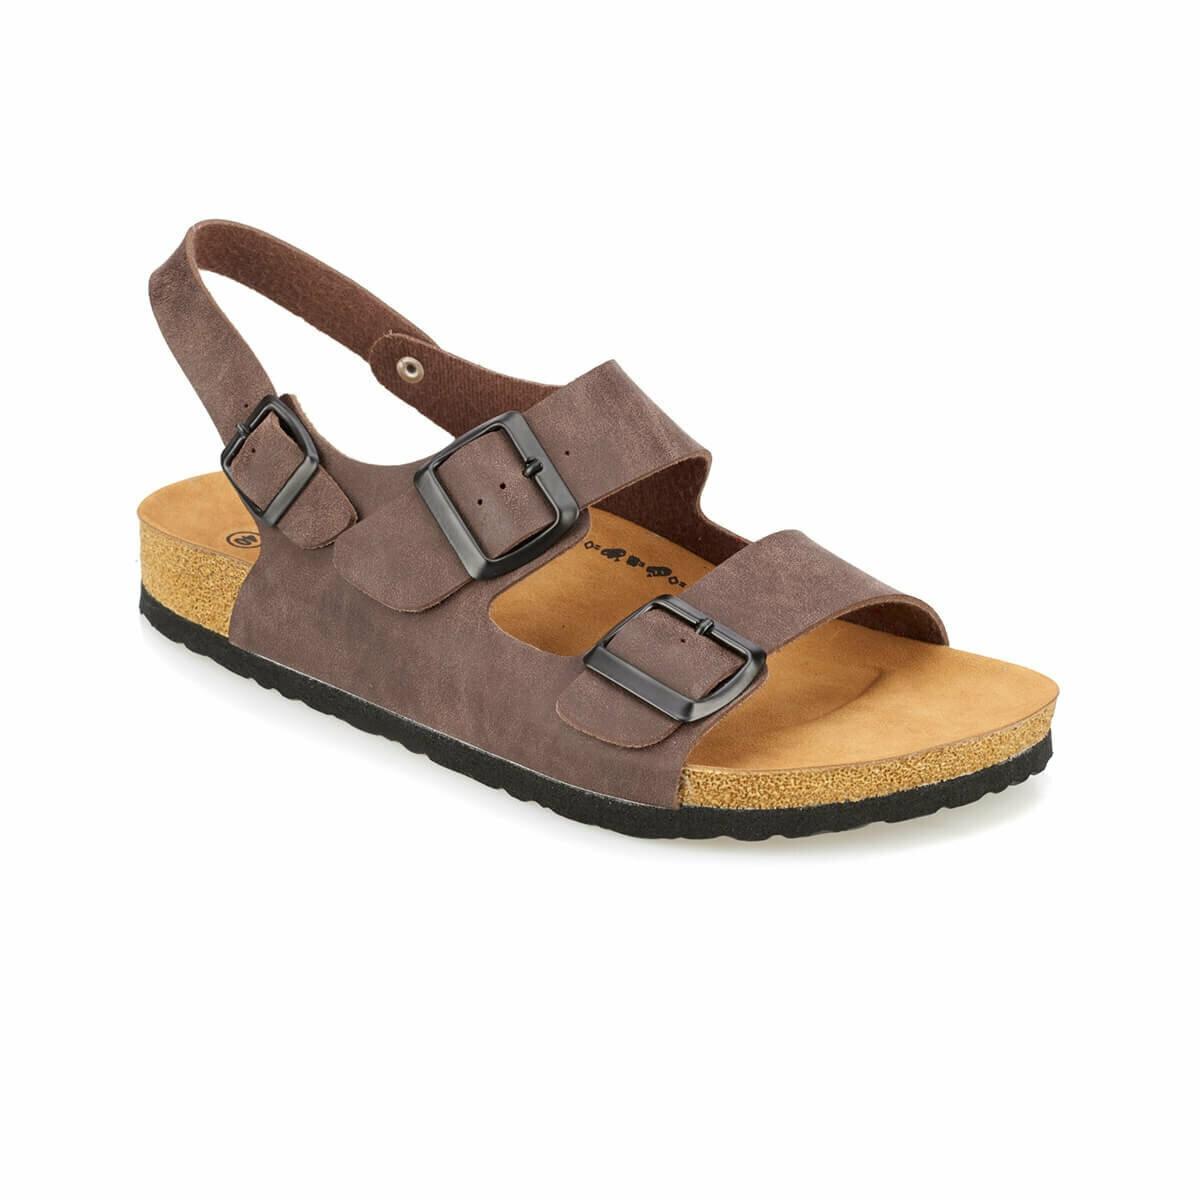 FLO Men Sandals Summer Season Comfortable Fashion Brown Male Sandals Мужские сандалии FEDON KINETIX